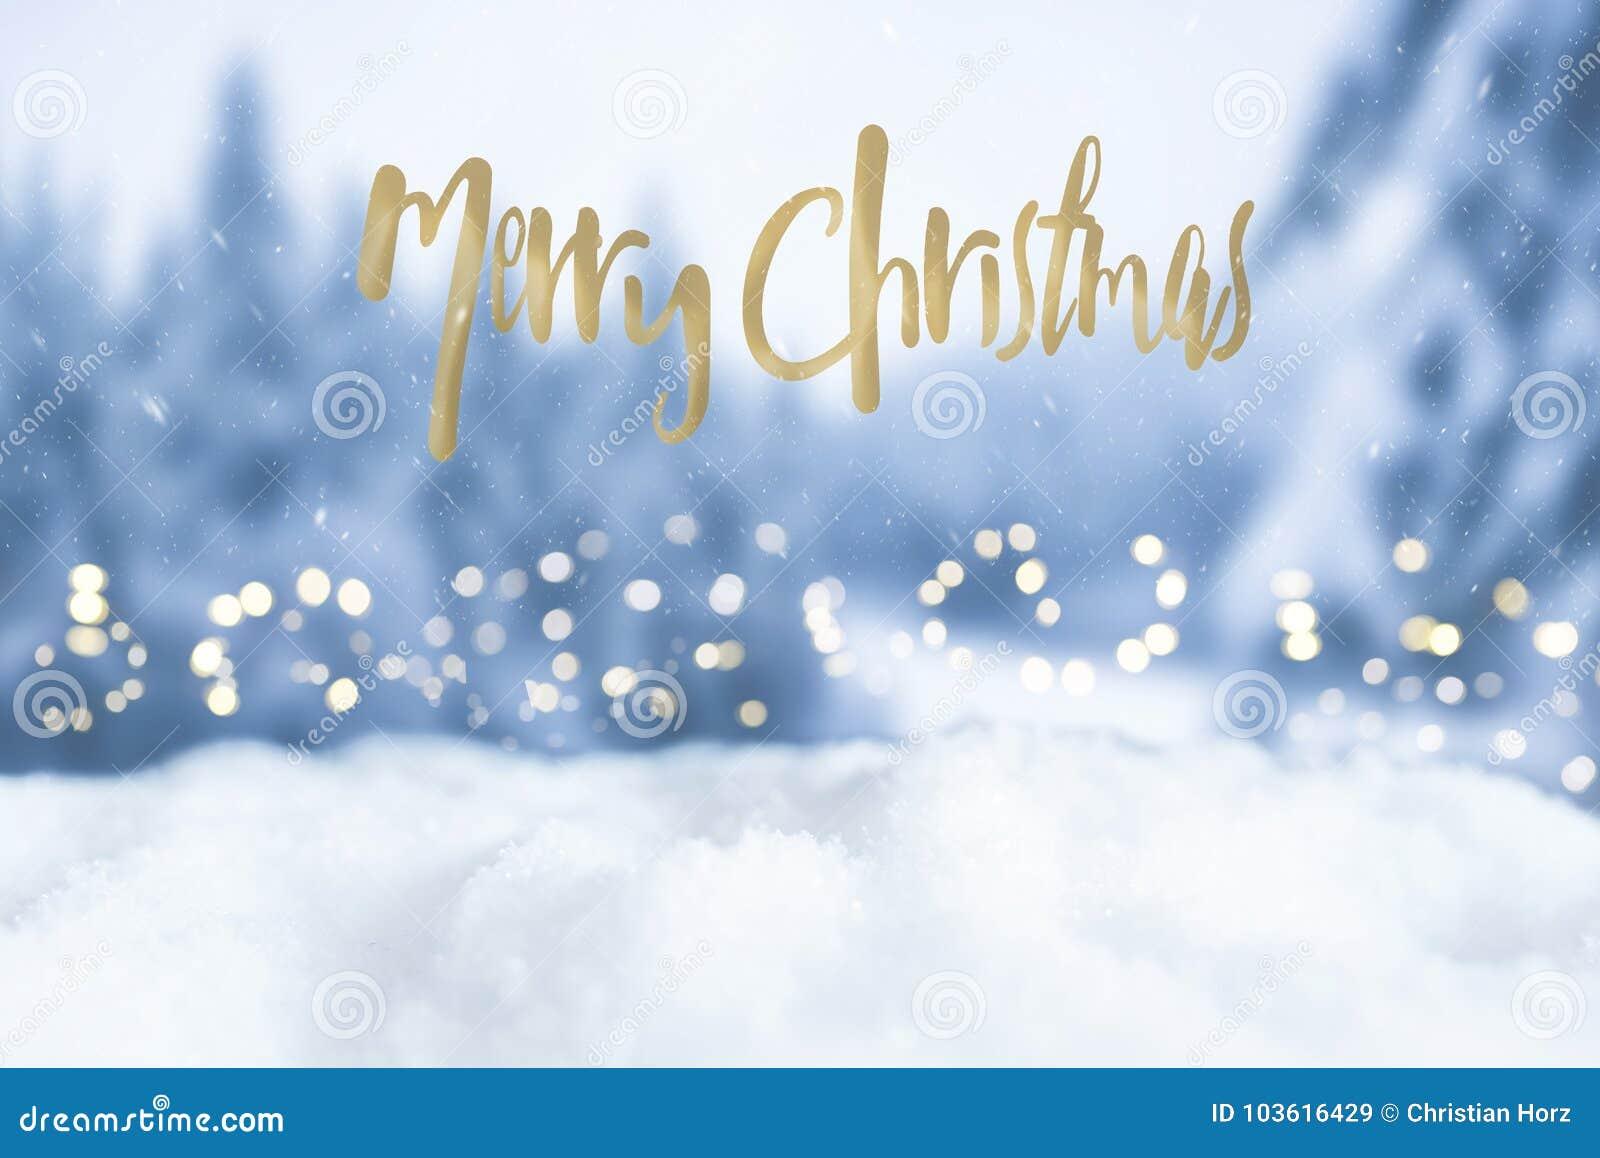 Christmas Bokeh Greeting Card With Merry Christmas Greeting Words